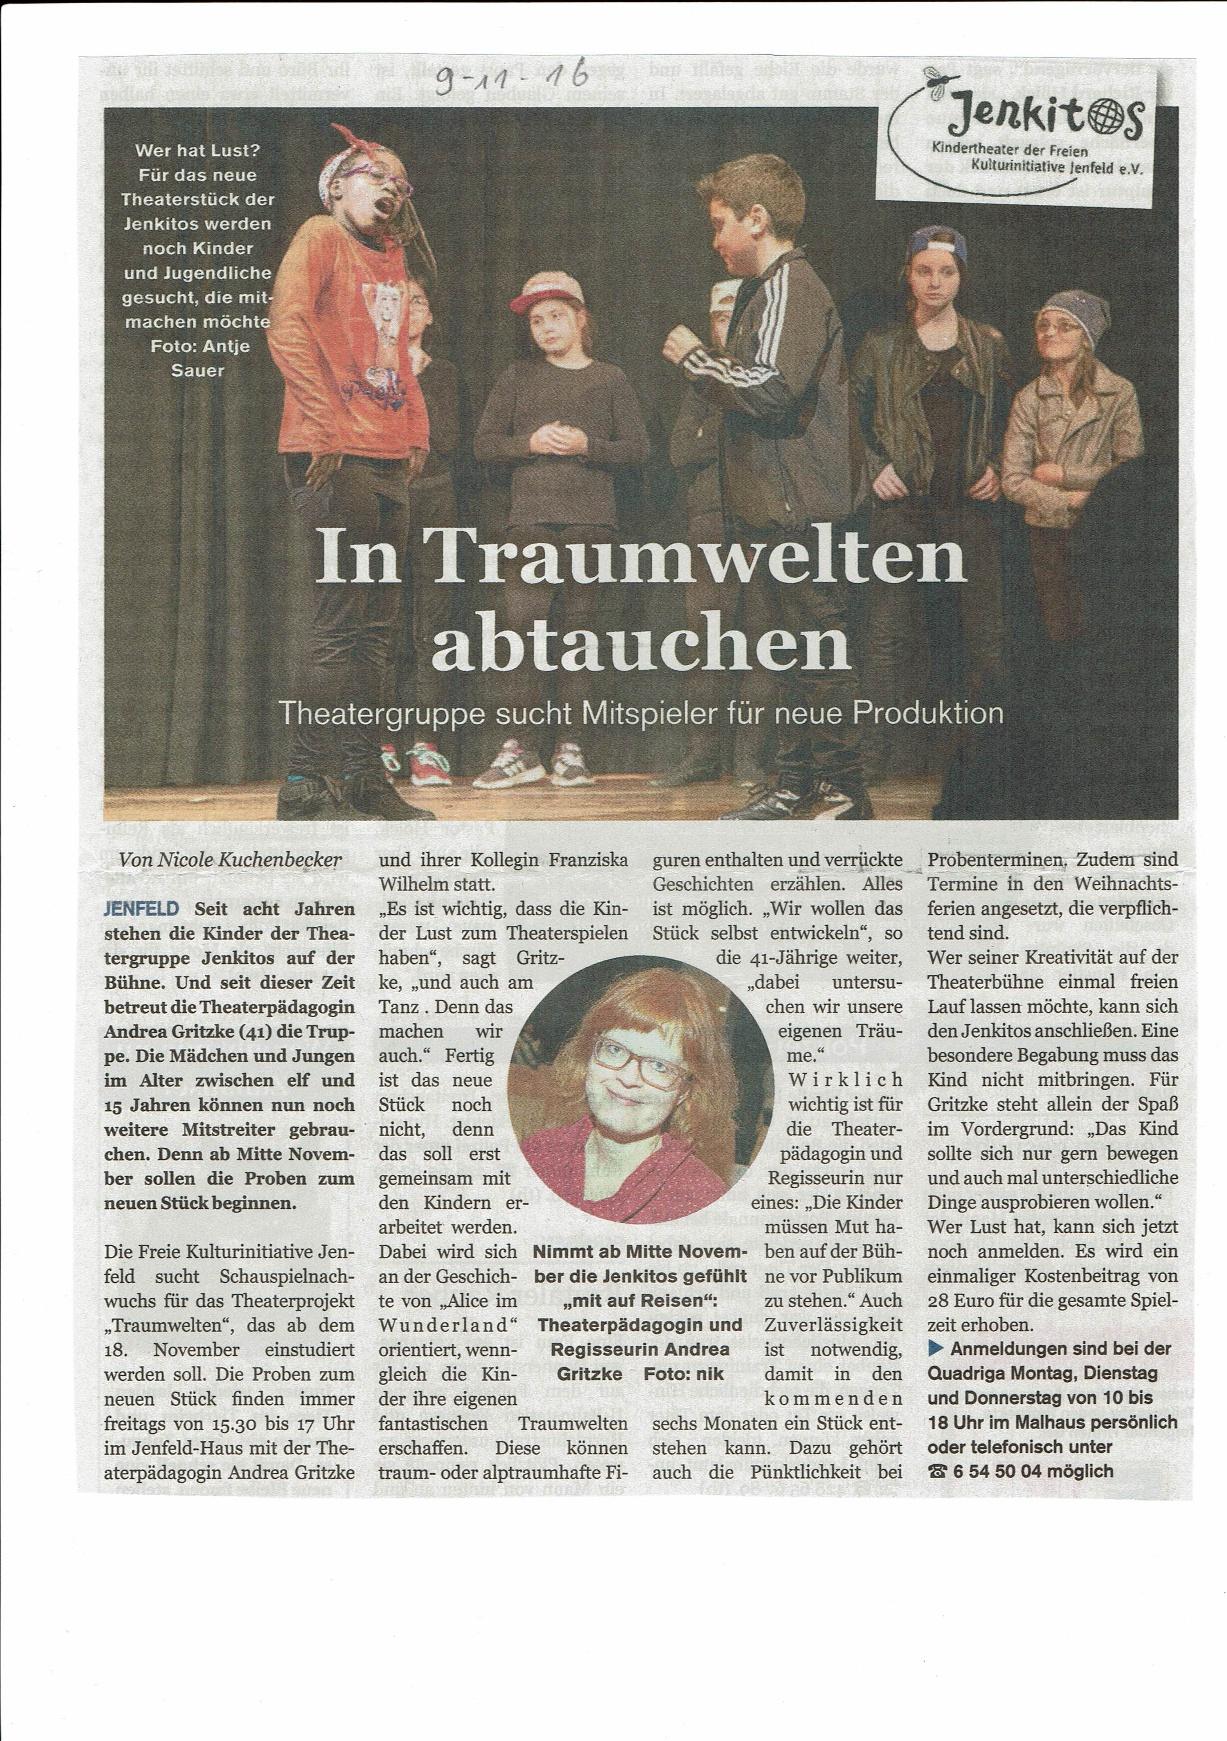 Artikel_Wochenblatt_Projektankuendigung_v._09.11._farbig - Kopie